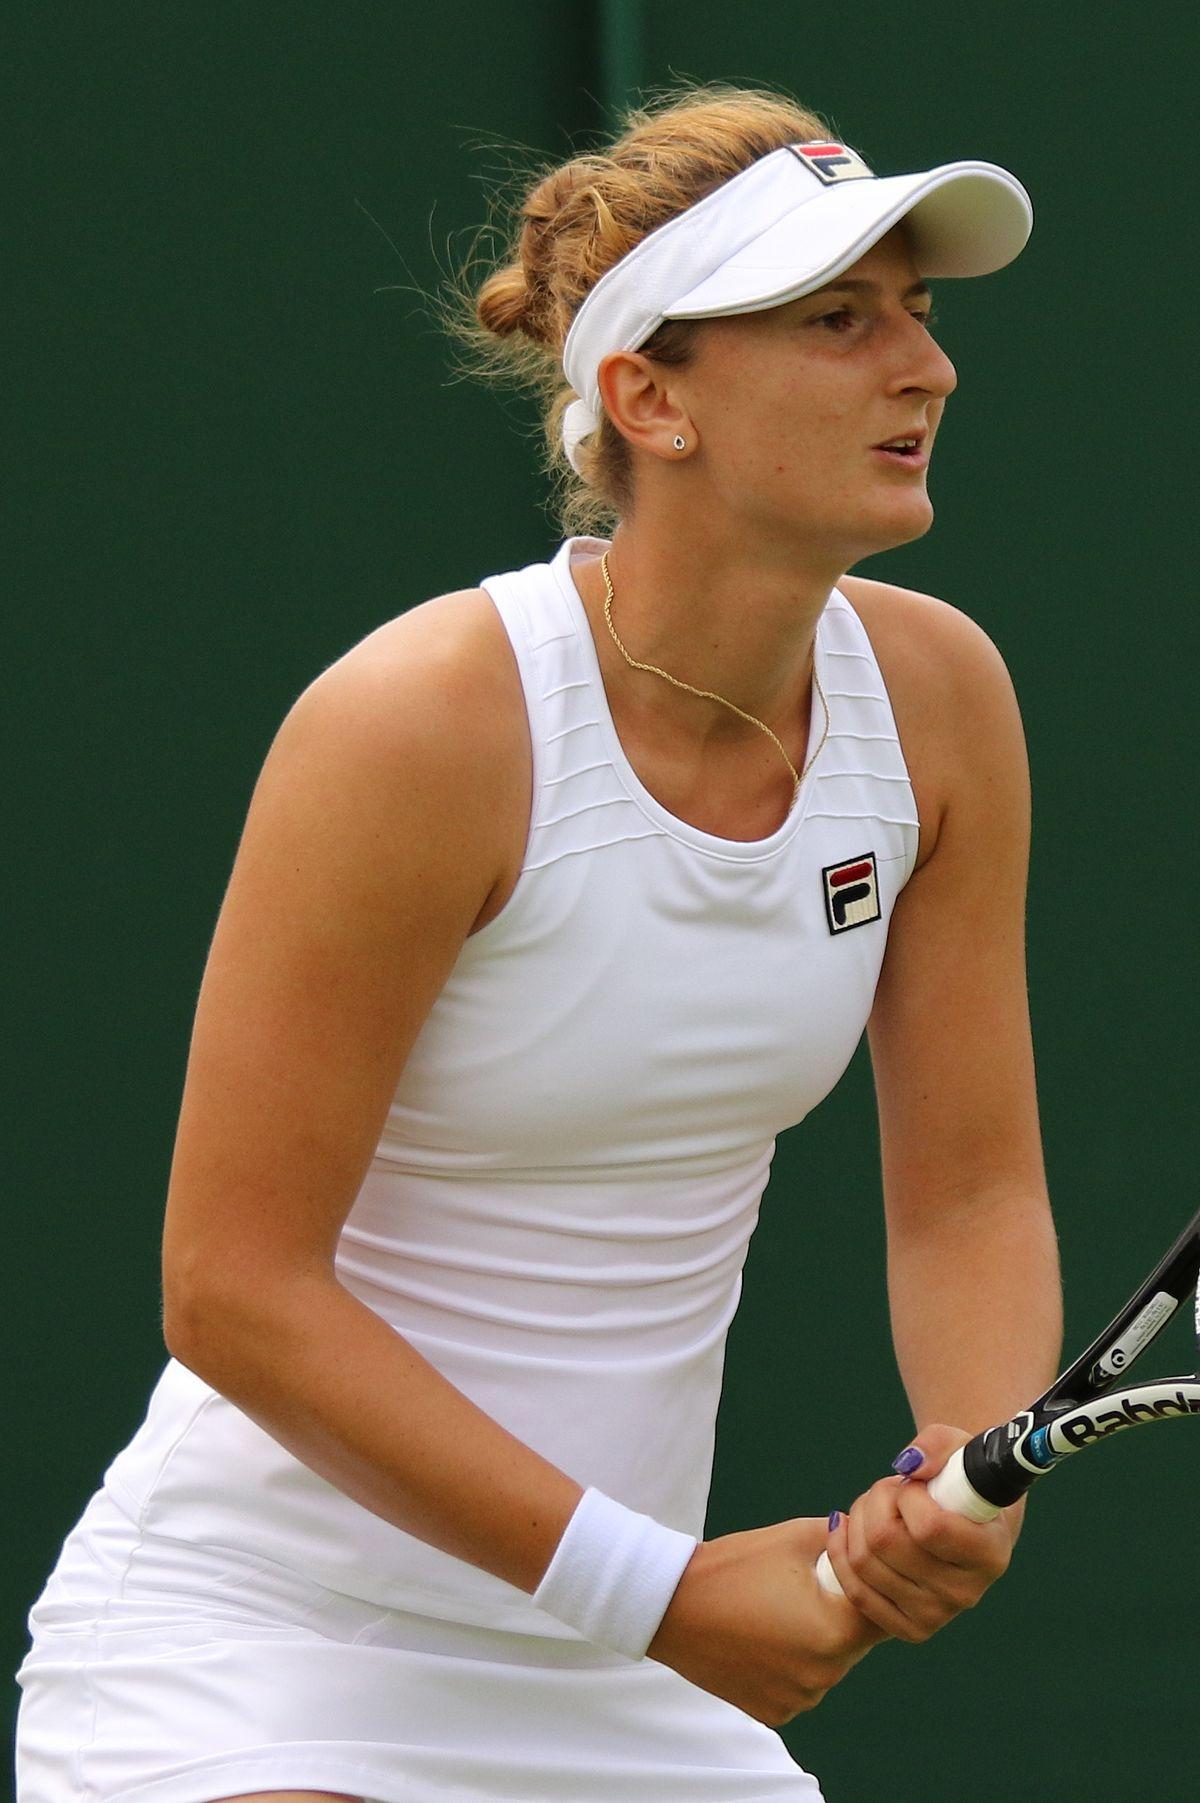 tennis.com - Begging to Differ  |Begu